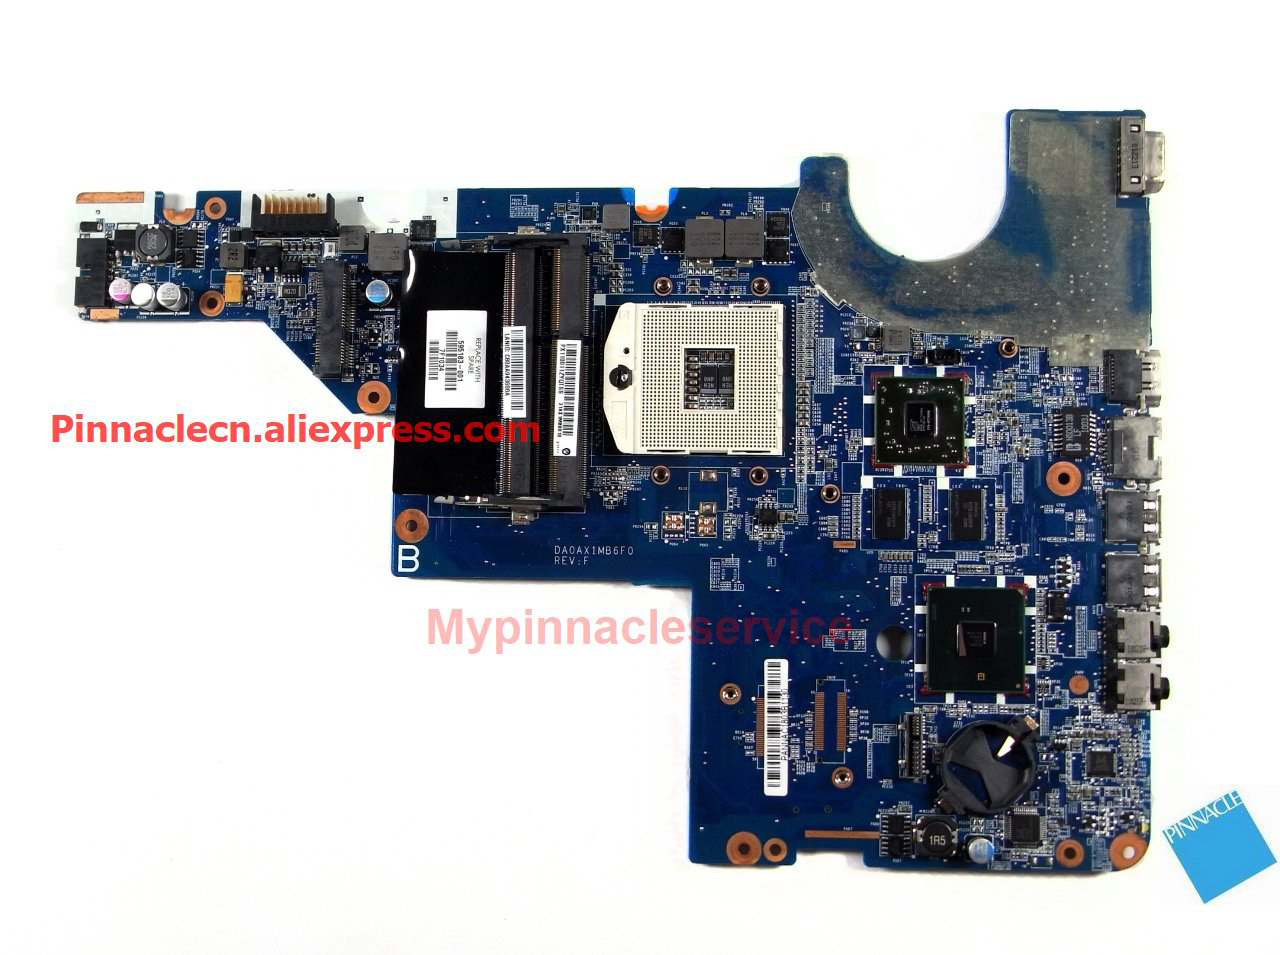 595183-001 Motherboard for HP CQ42 G42 G62 G62 G72 DA0AX1MB6F1